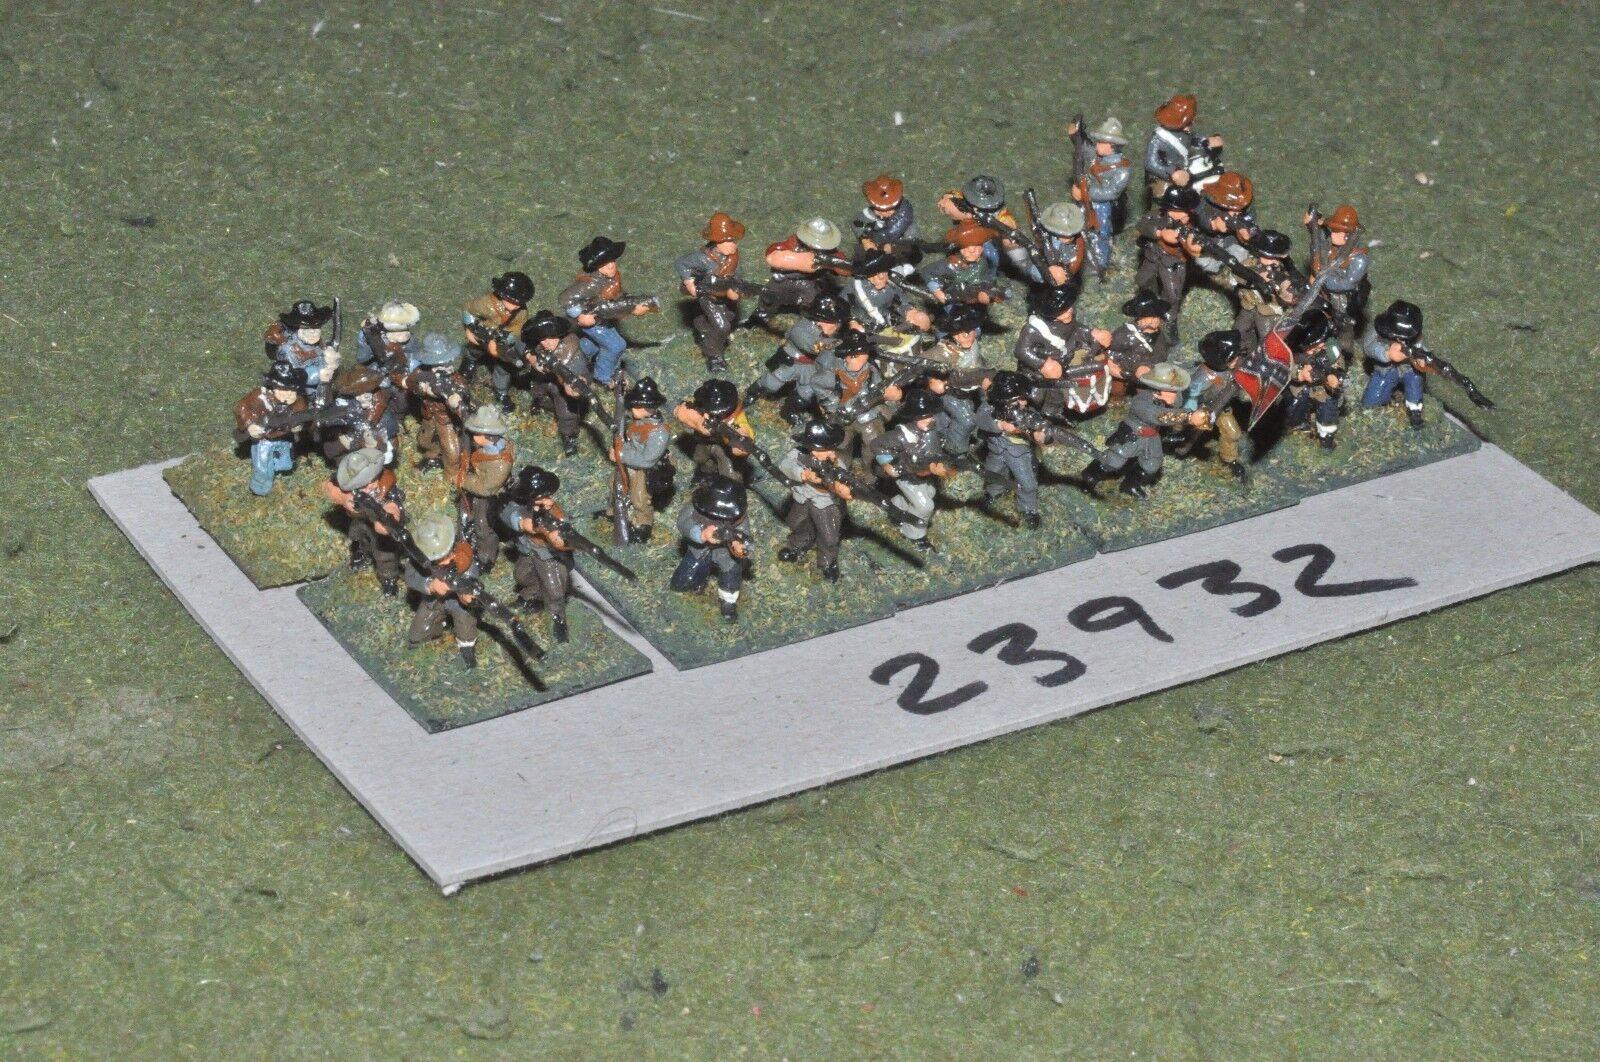 15mm ACW   confederate - regiment 39 figures - inf (23932)